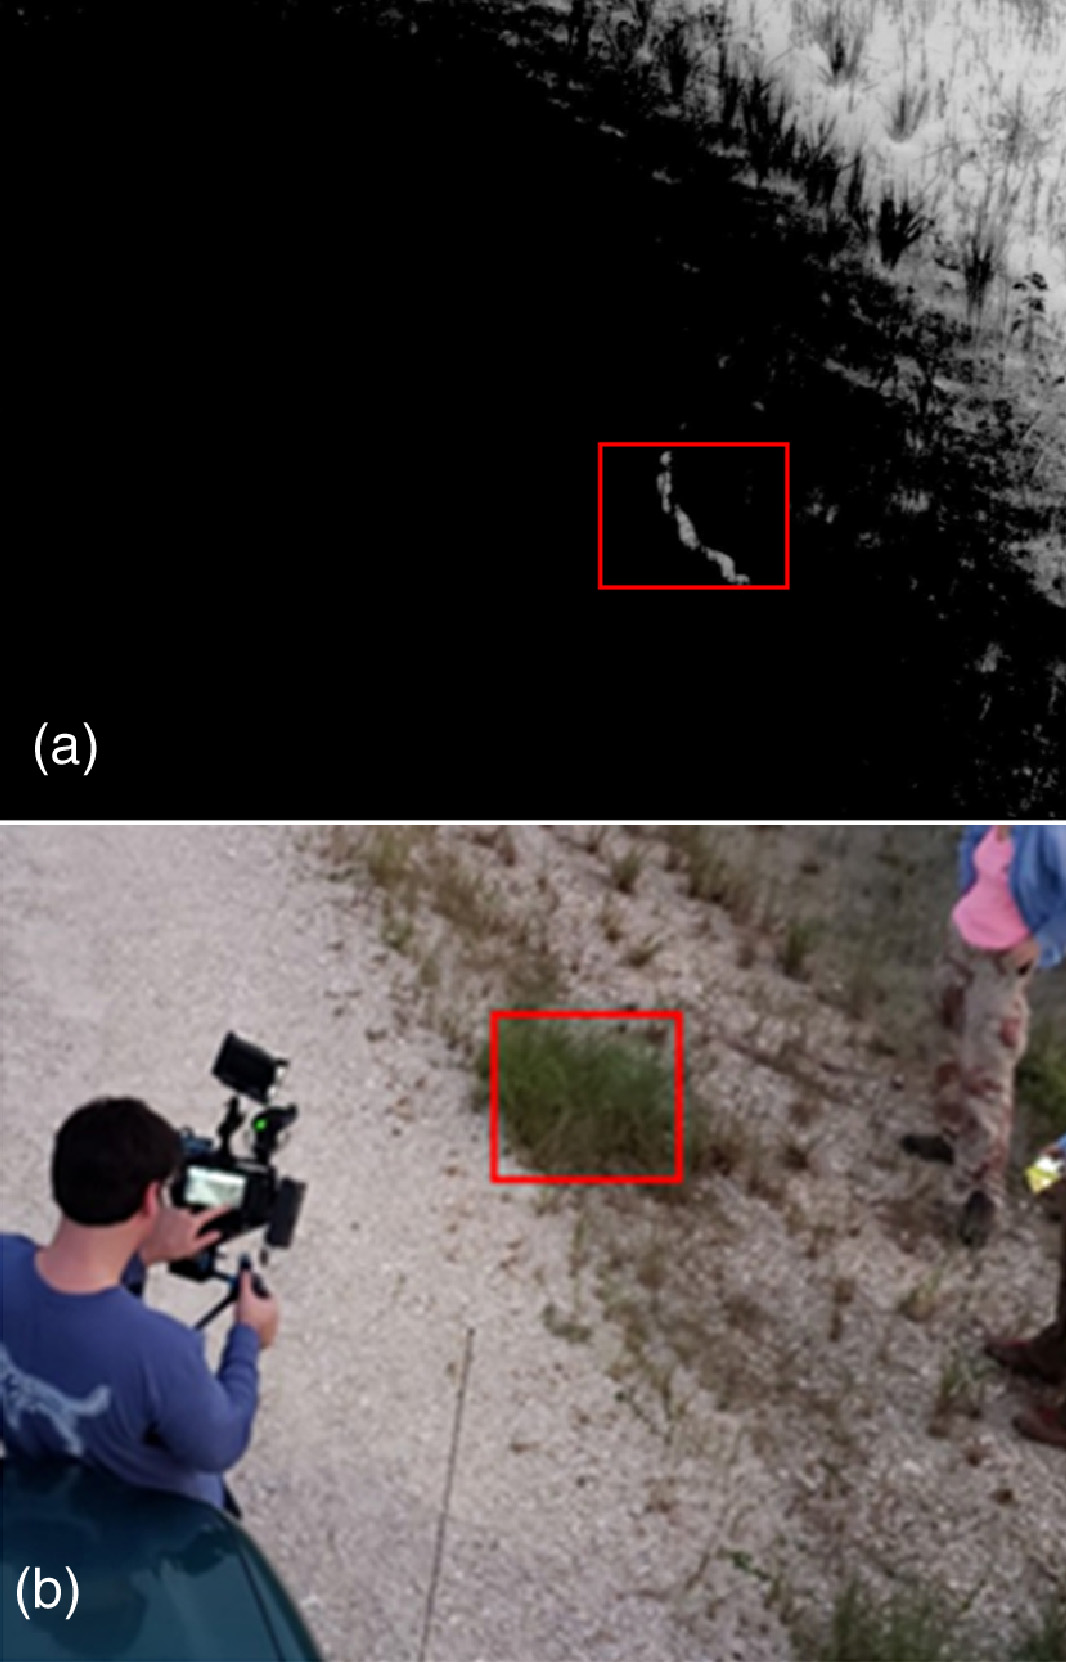 Burmese pythons image taken with NIR camera copy (top), traditional visible-light camera (bottom)